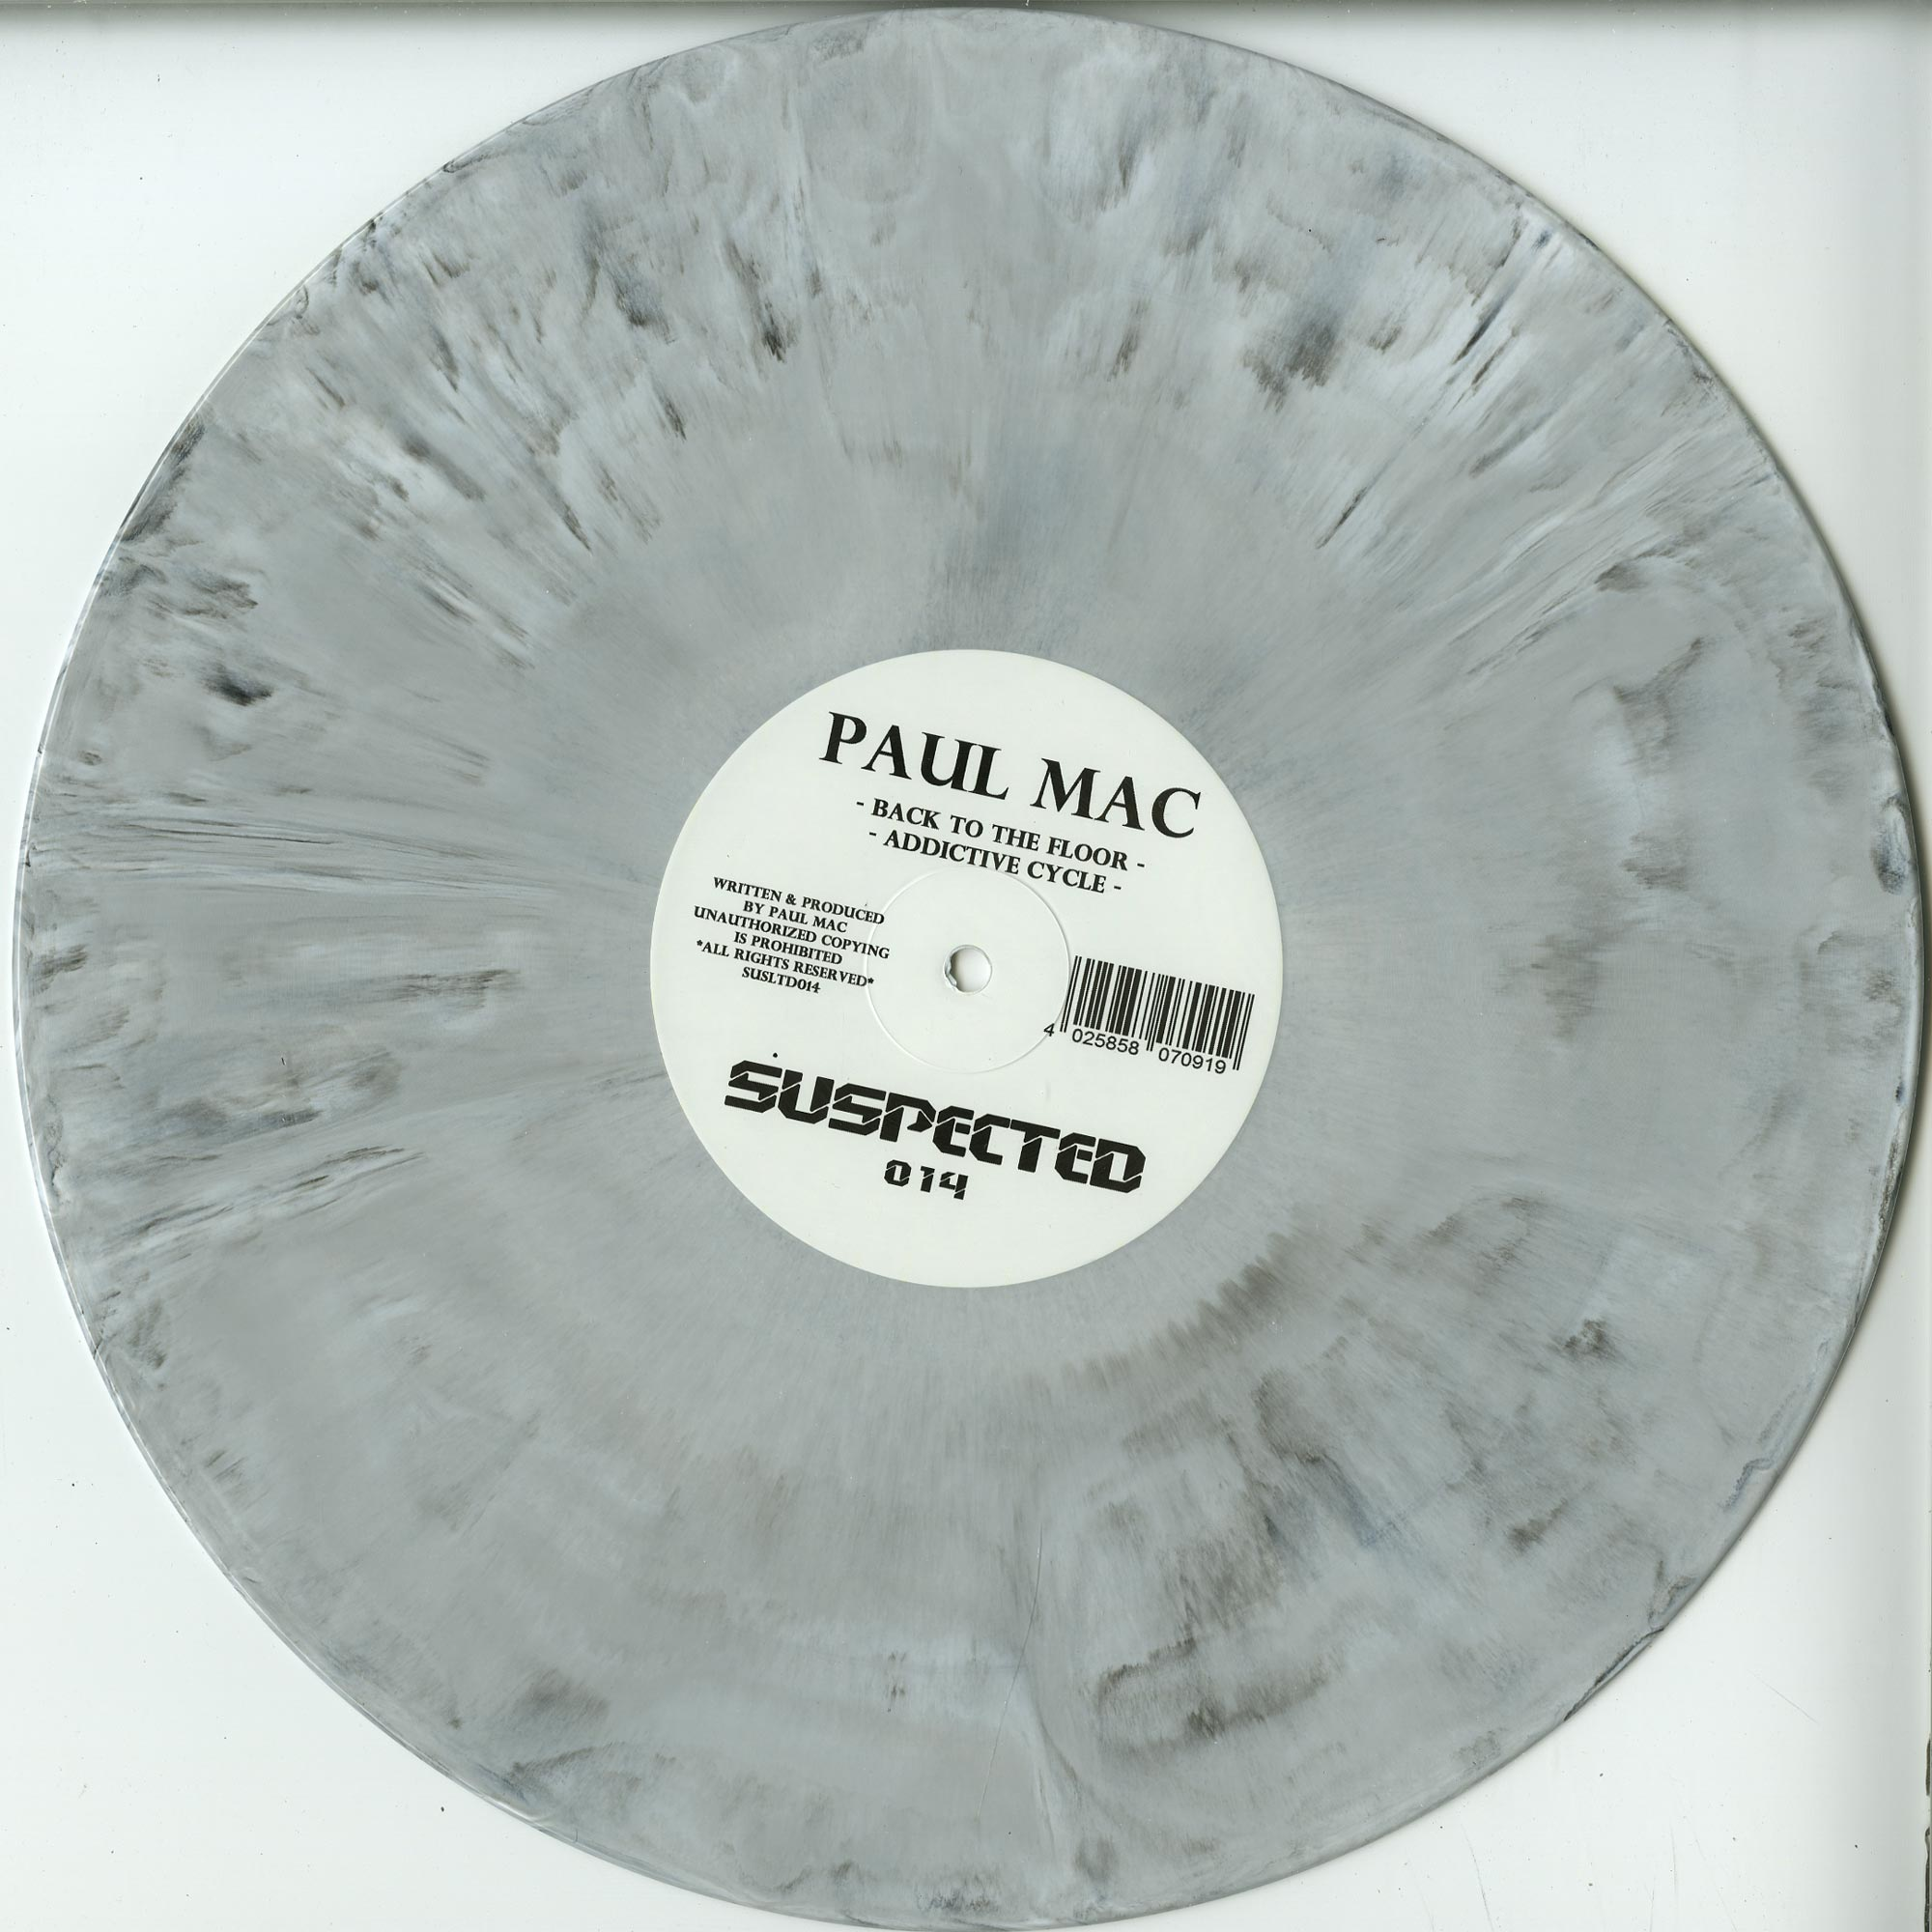 Paul Mac - BACK TO THE FLOOR